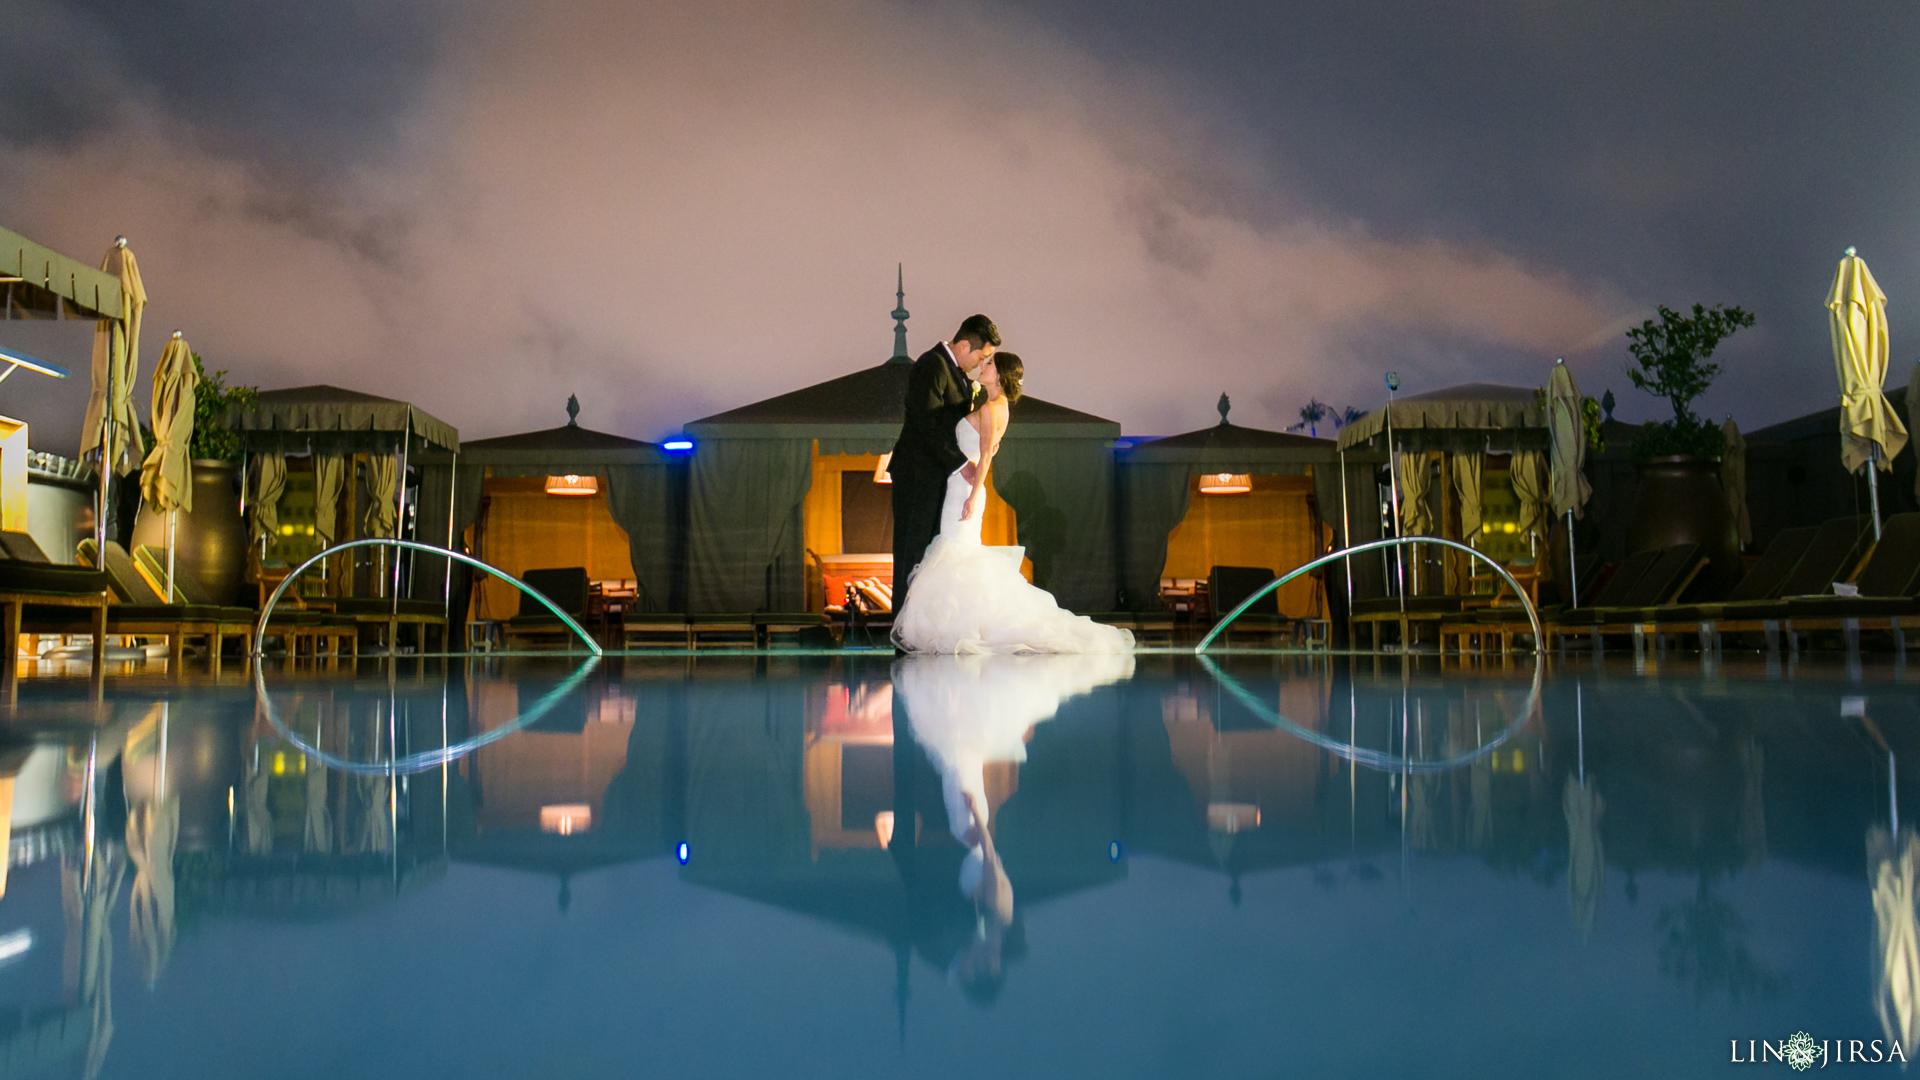 SLS-Hotel-Los-Angeles-Wedding-Photography-Photography-Edit(1)